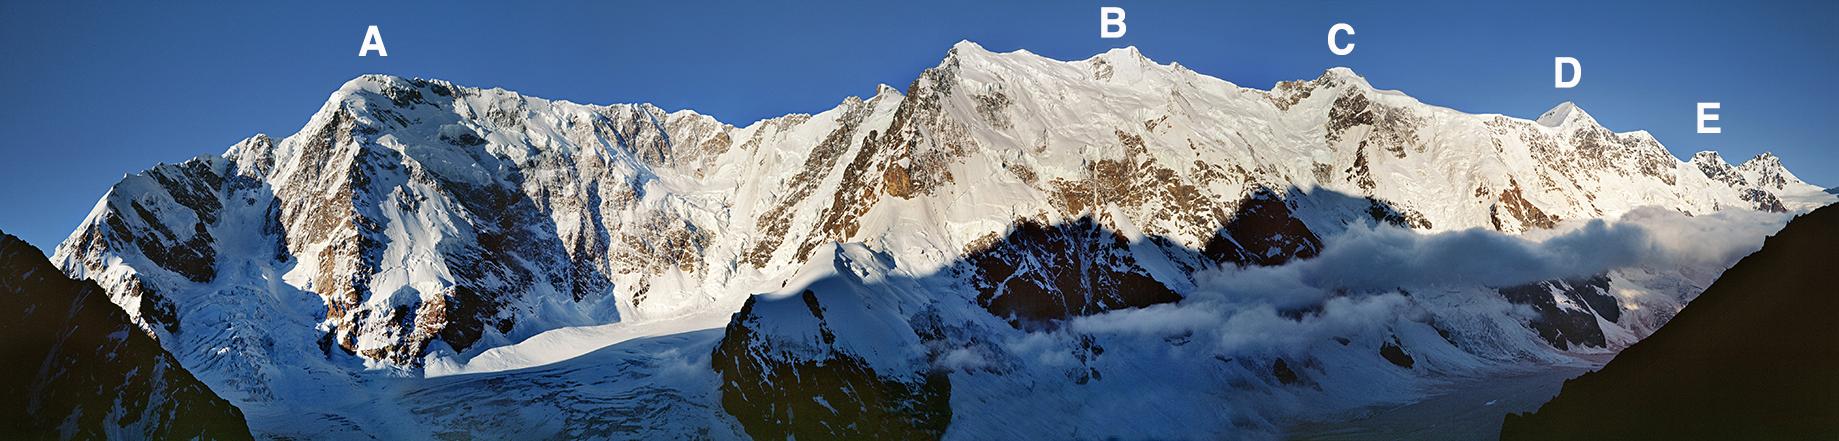 The ca 13km Bezengi Wall from the north. (A) Main Shkhara (5,200m). (B) Main Jangi-Tau (5,085m). (C) Katyn-Tau (4,974m). (D) Gestola (4,860m). (E) Lial'ver (4,350m).